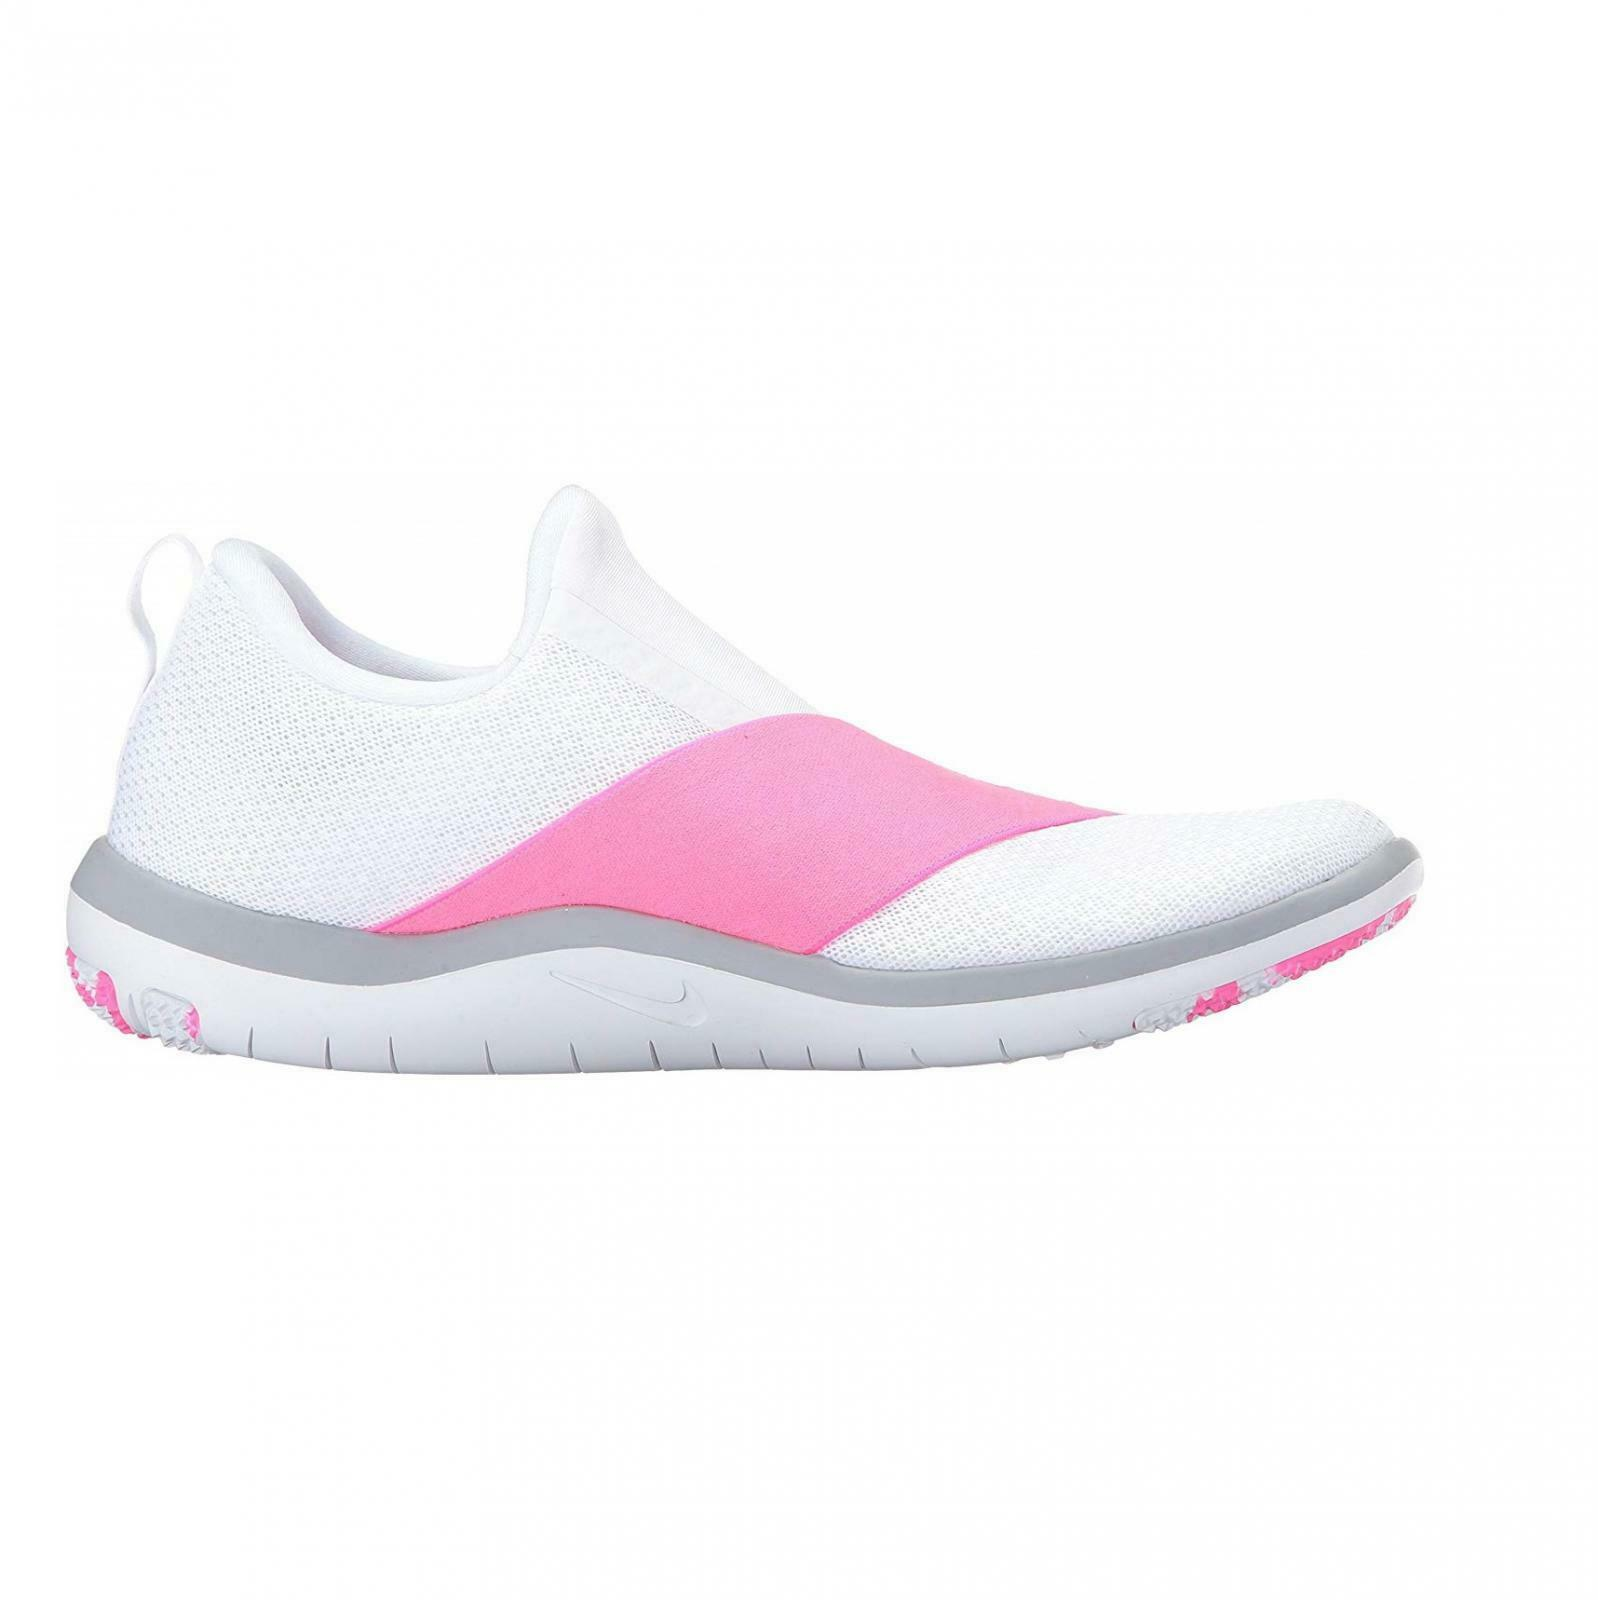 Donna Nike Free Connect Qs Scarpe da Ginnastica Bianche 885163 106